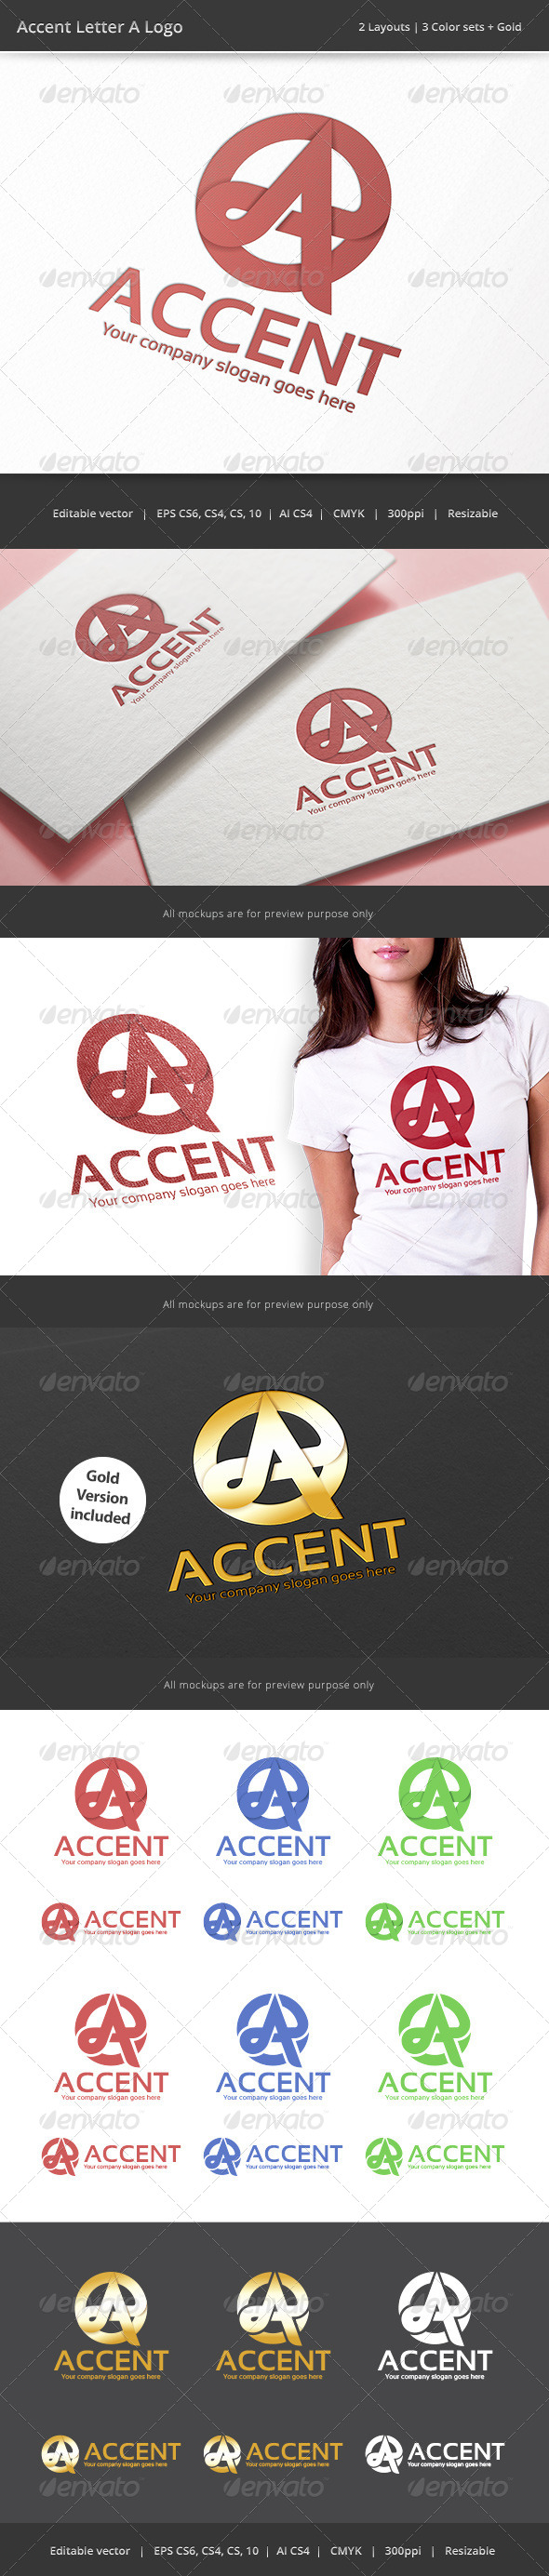 Accent Letter A Logo